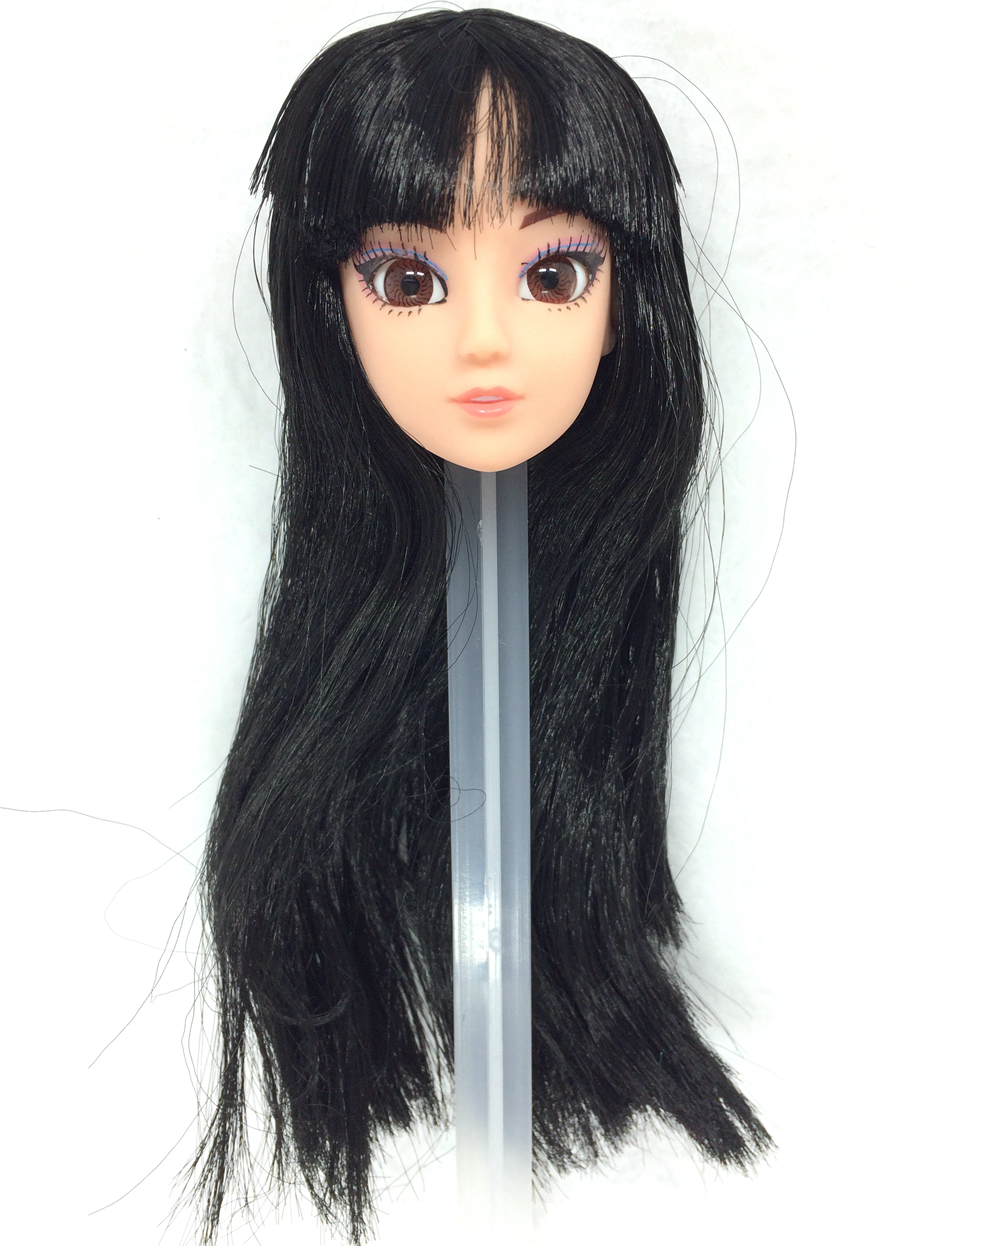 NK One Pcs Fashion Doll Head Black Hair 3D Eyes DIY Accessories For Barbie Kurhn Doll Best Girl Gift Child DIY Toys 024T